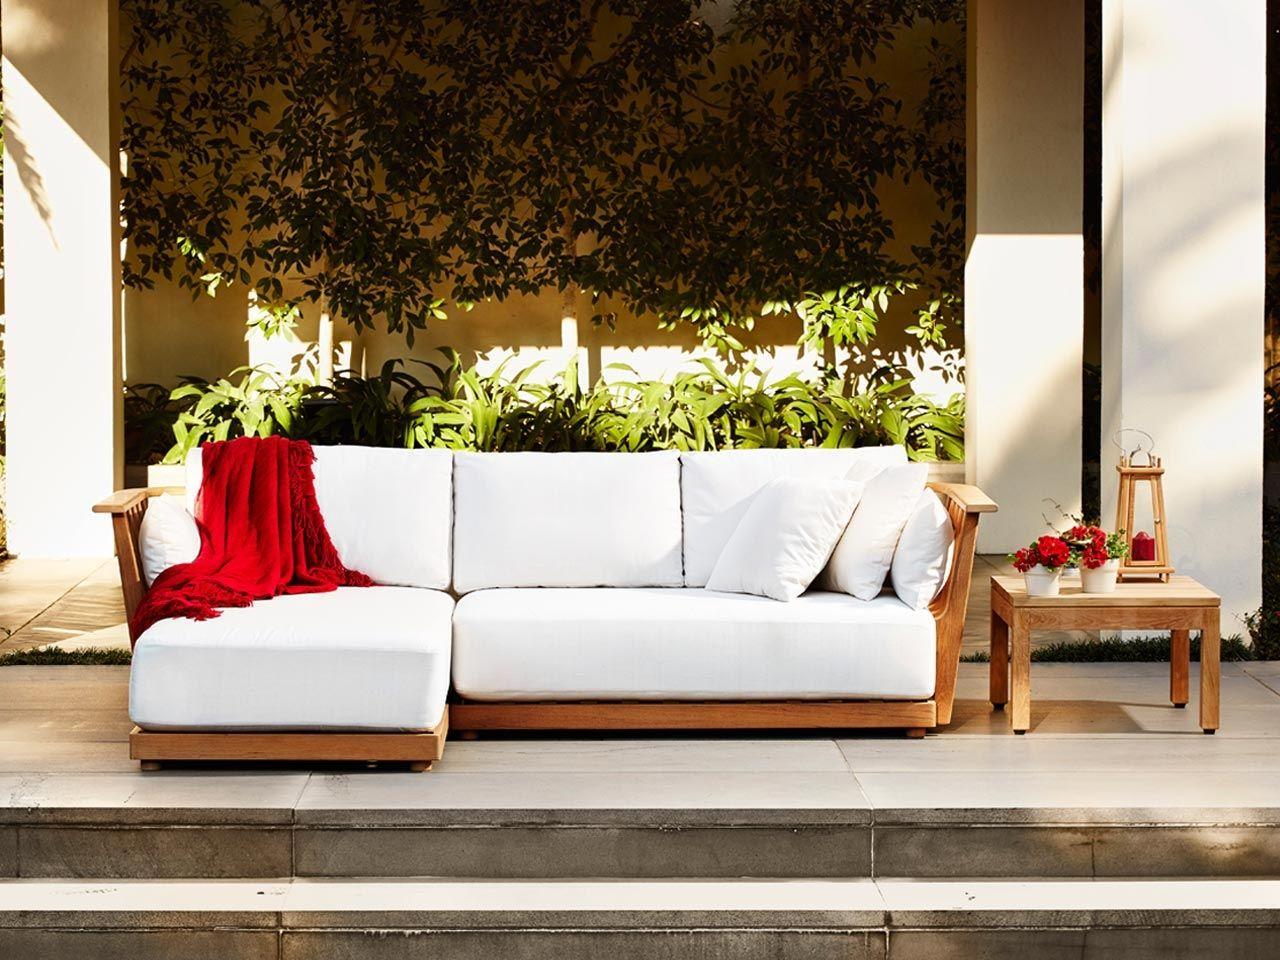 Dorable Muebles De Exterior Melbourne Jati Ideas Ornamento ...